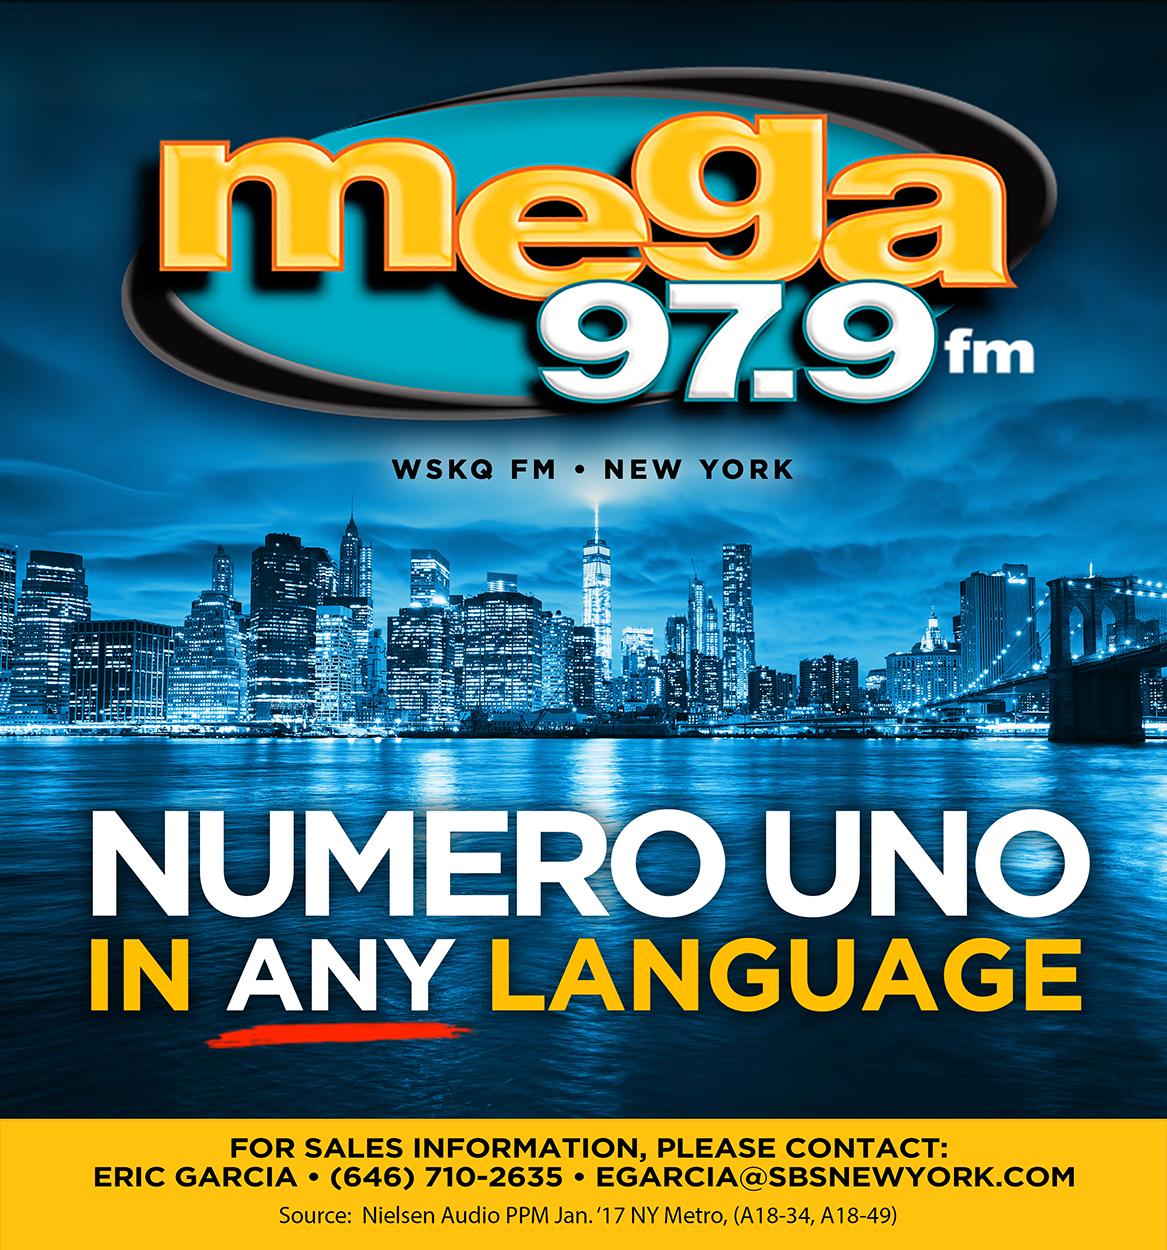 wskq fm mega 97 9fm hispanic station ranks no 1 in new york across